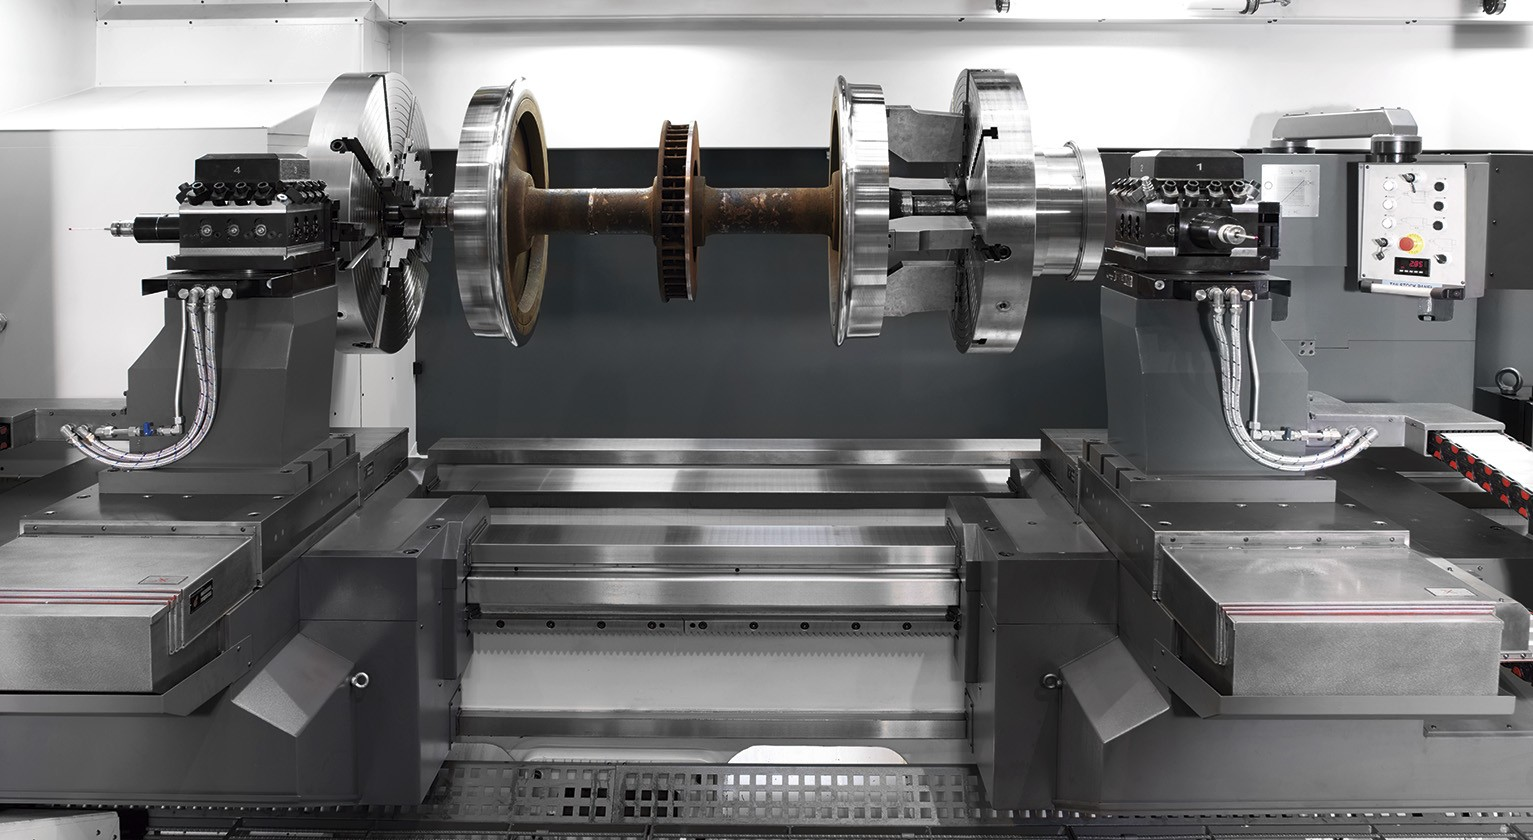 Galería tornos horizontales - foto 11 - Máquina Herramienta - Geminis Lathes